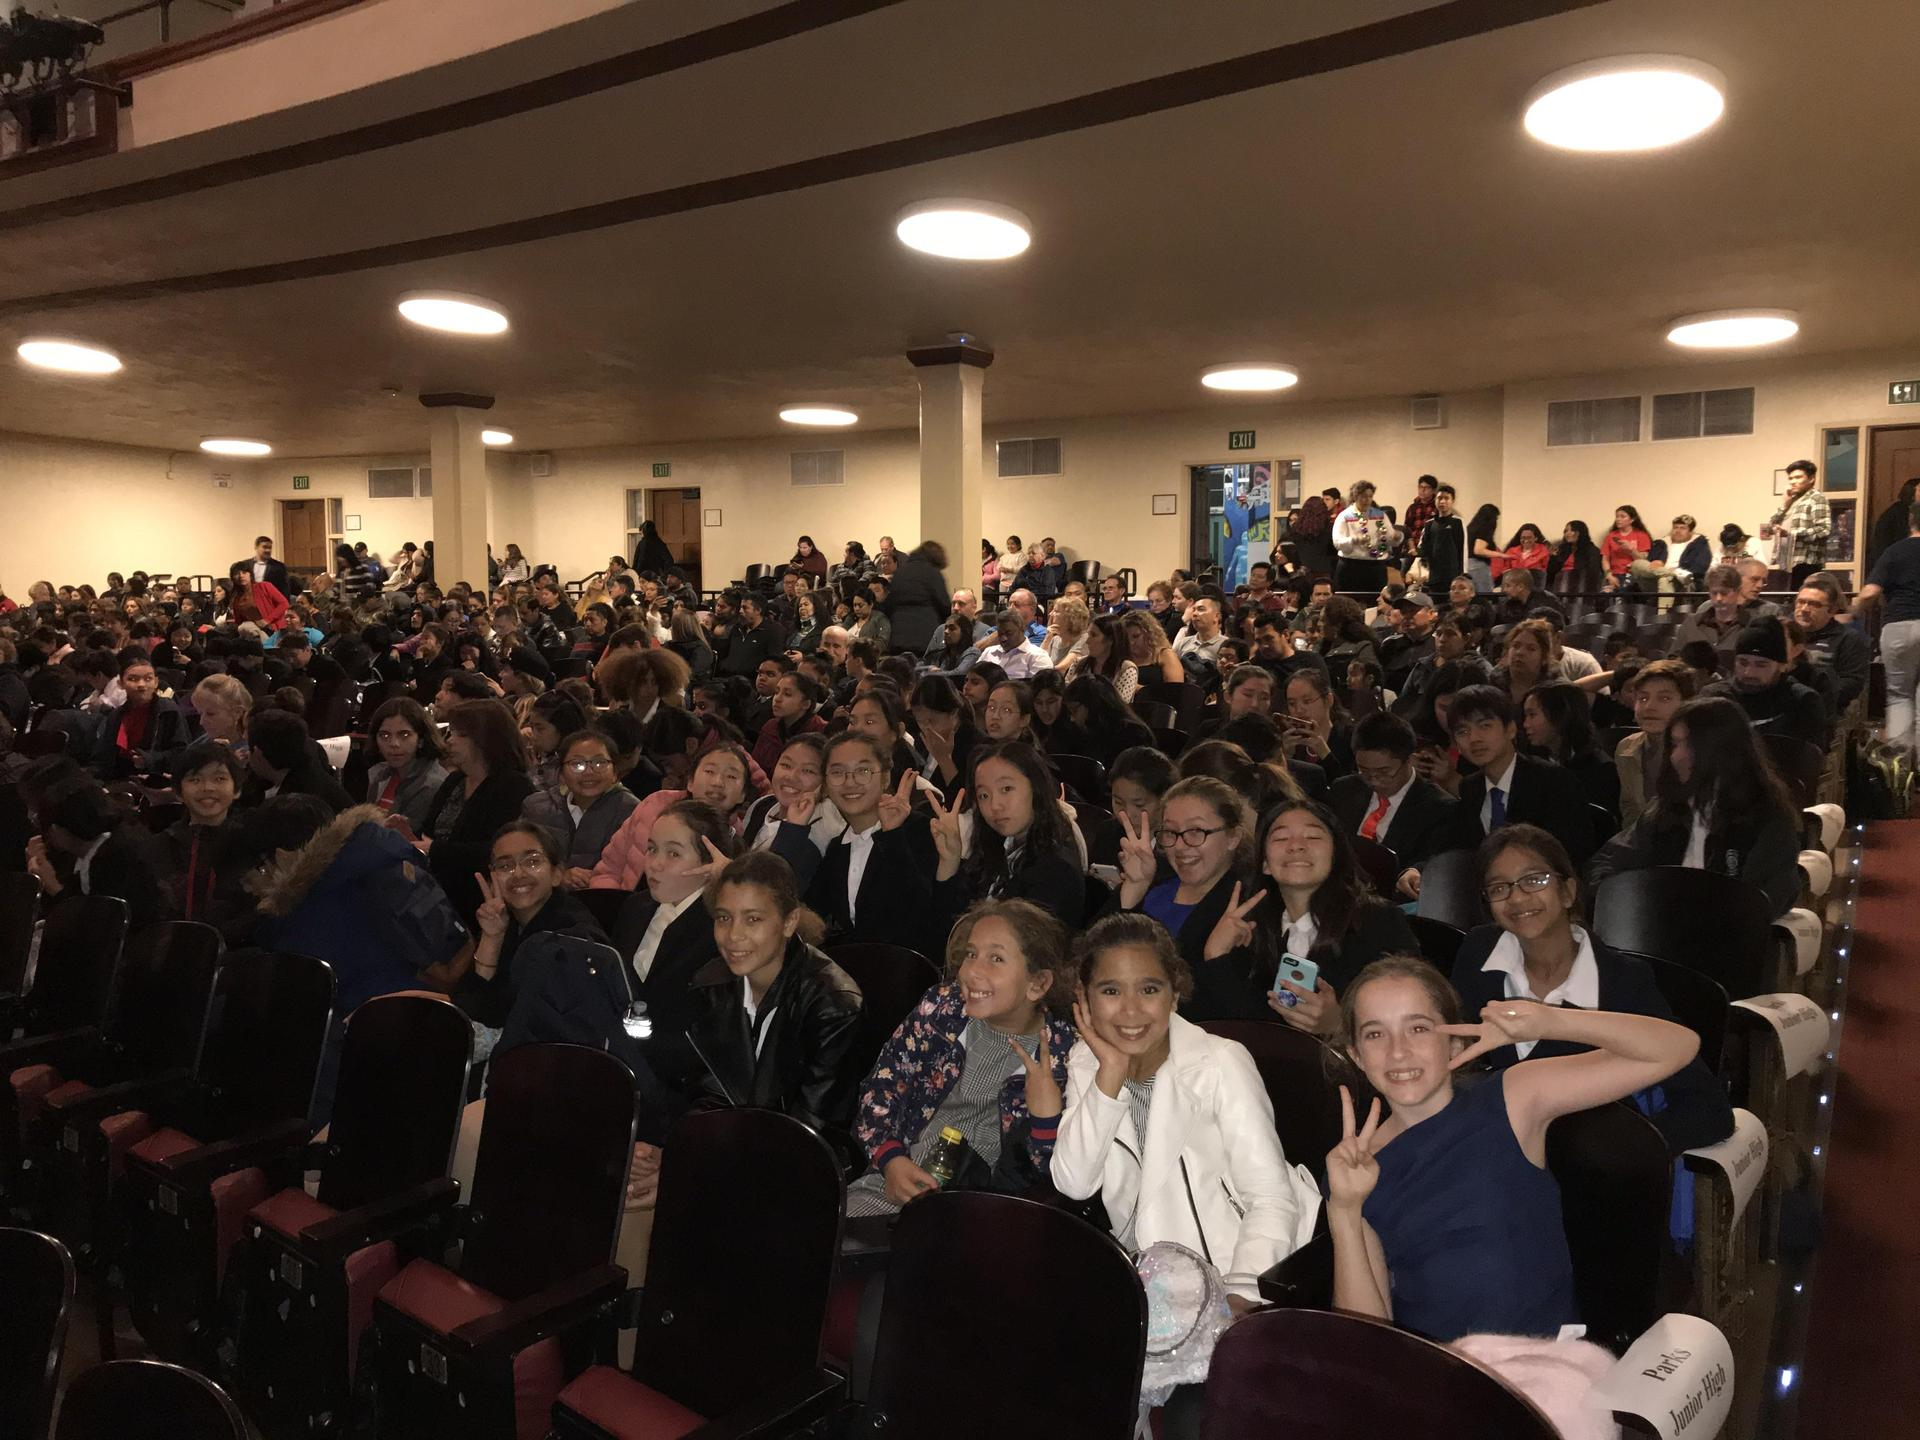 MIDDLE SCHOOL MARDI GRAS TOURNAMENT JANUARY 2020